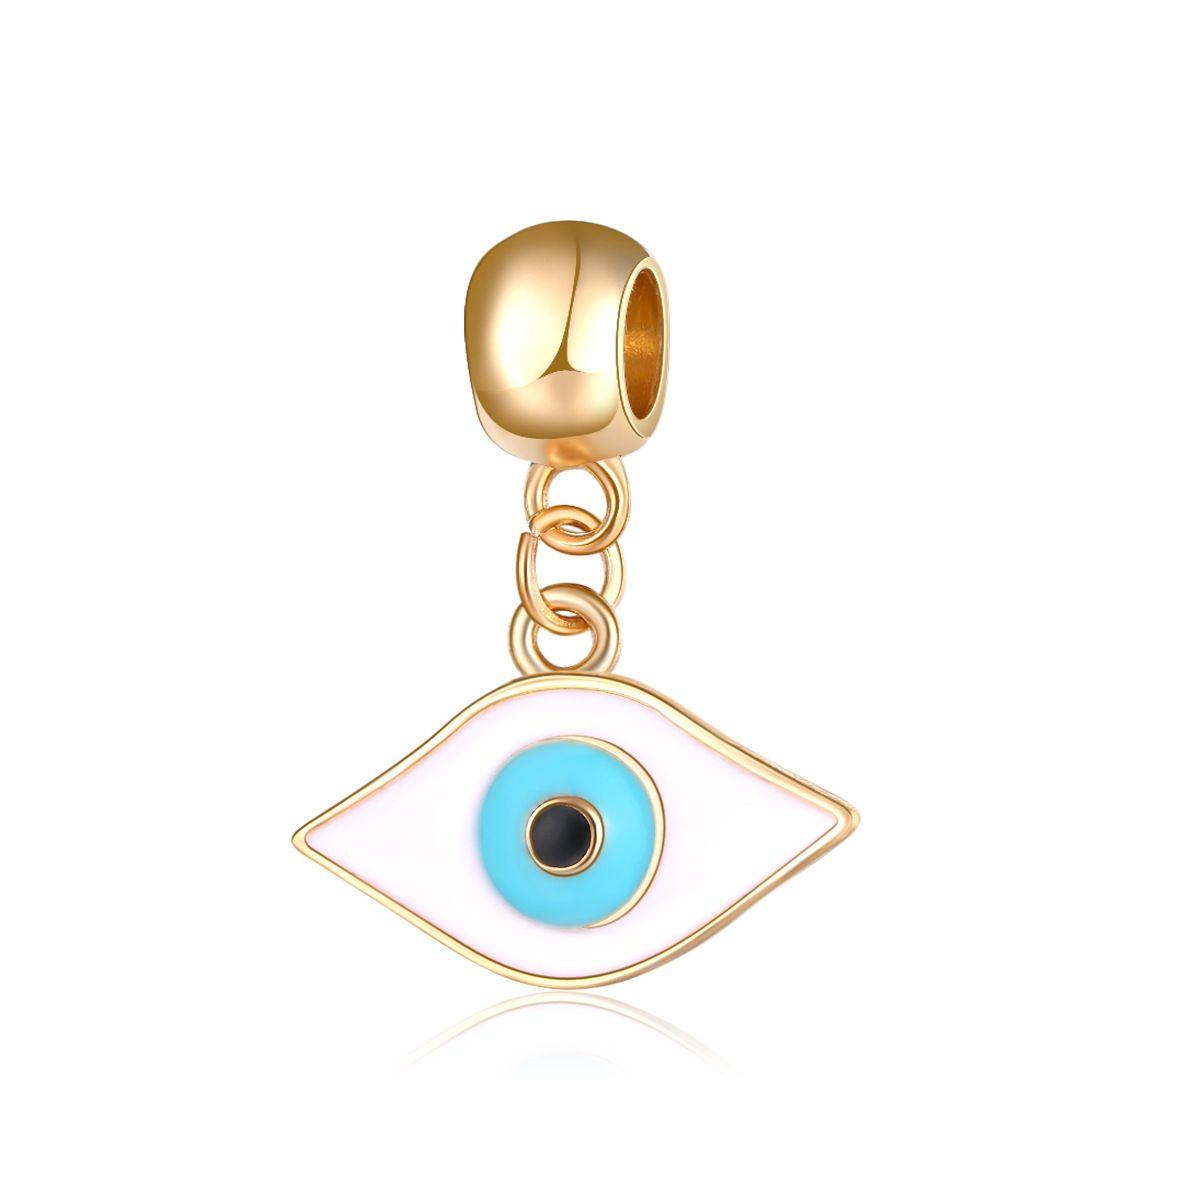 Turquoise Blue Shell Heart Dangle Charm for Silver European Style Bead Bracelets